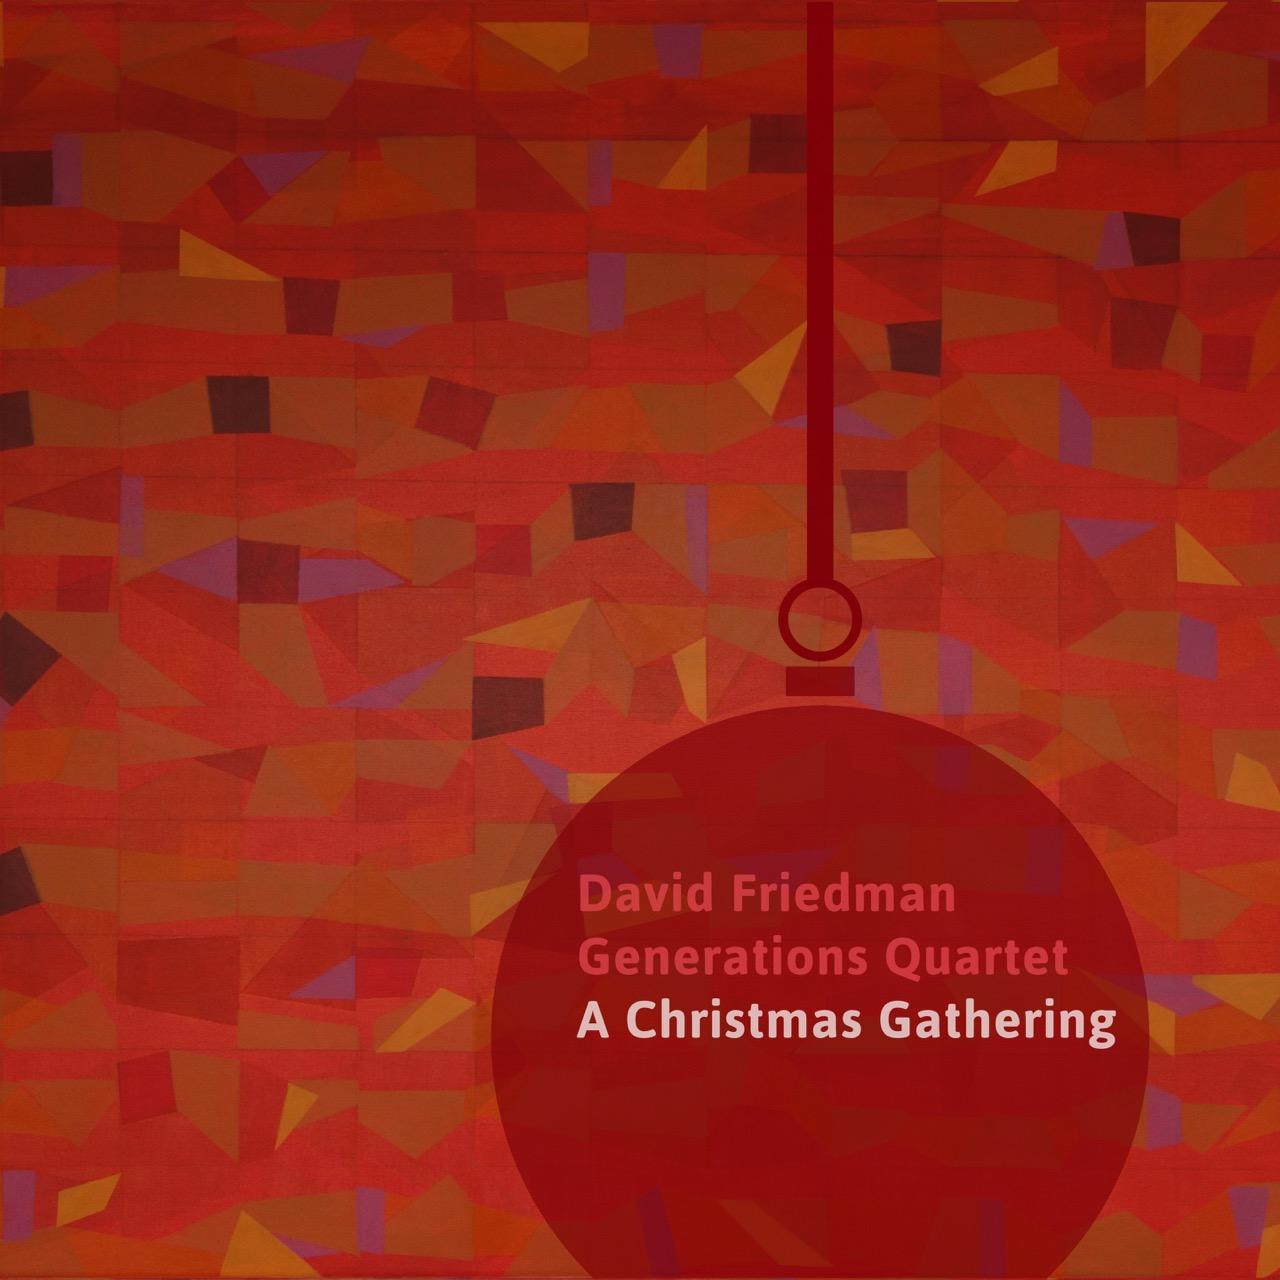 Album COVER - A Christmas Gathering